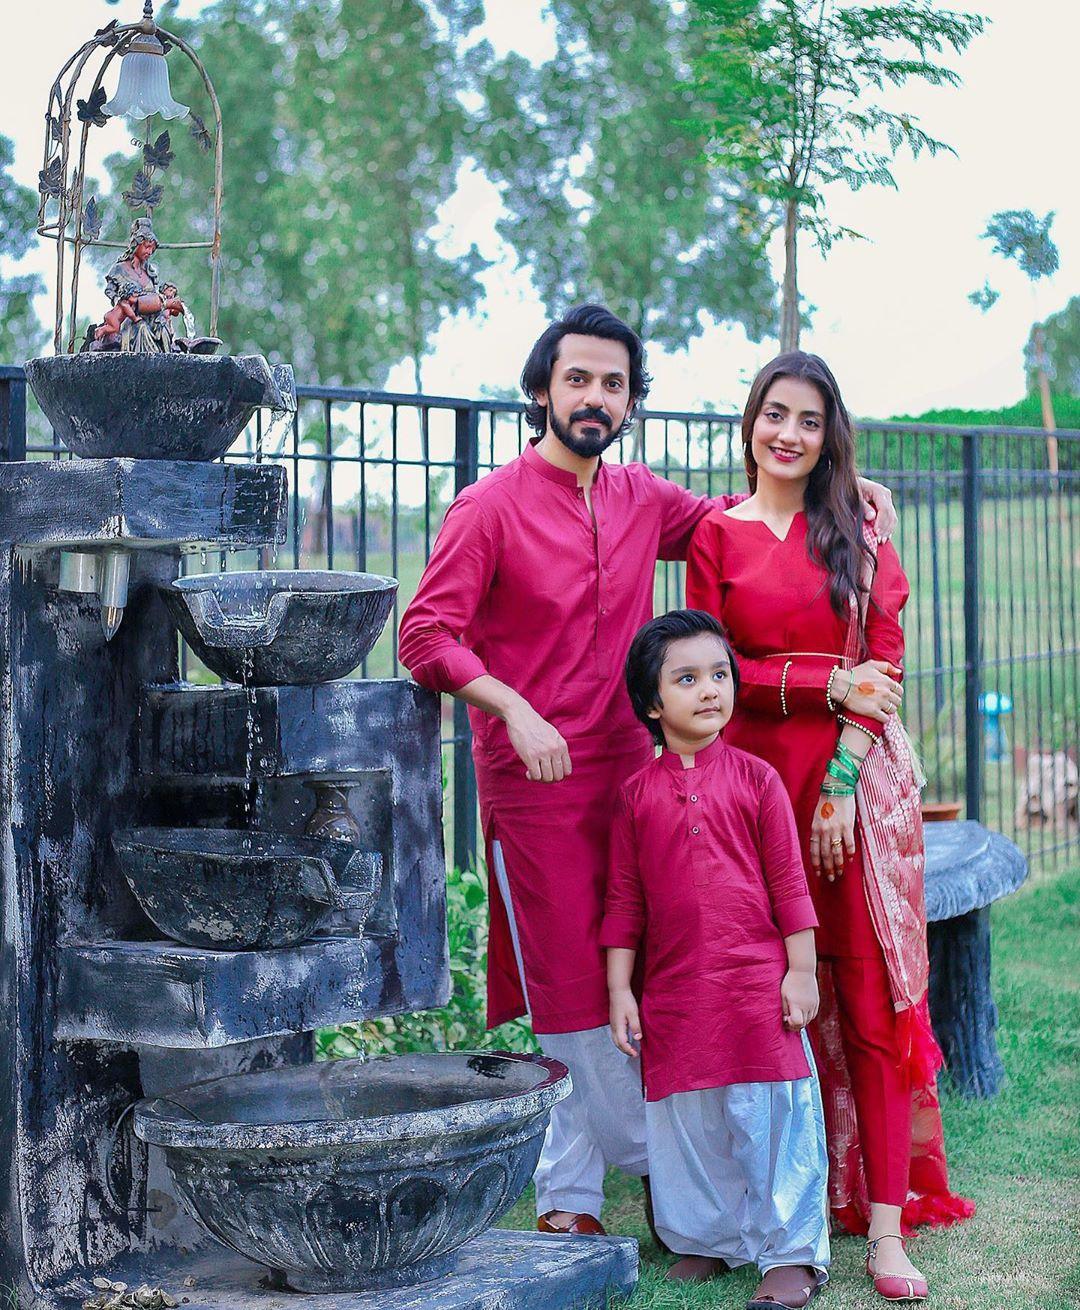 Clicks Of Bilal Qureshi And Uroosa Bilal Celebrating Eid-ul-Adha